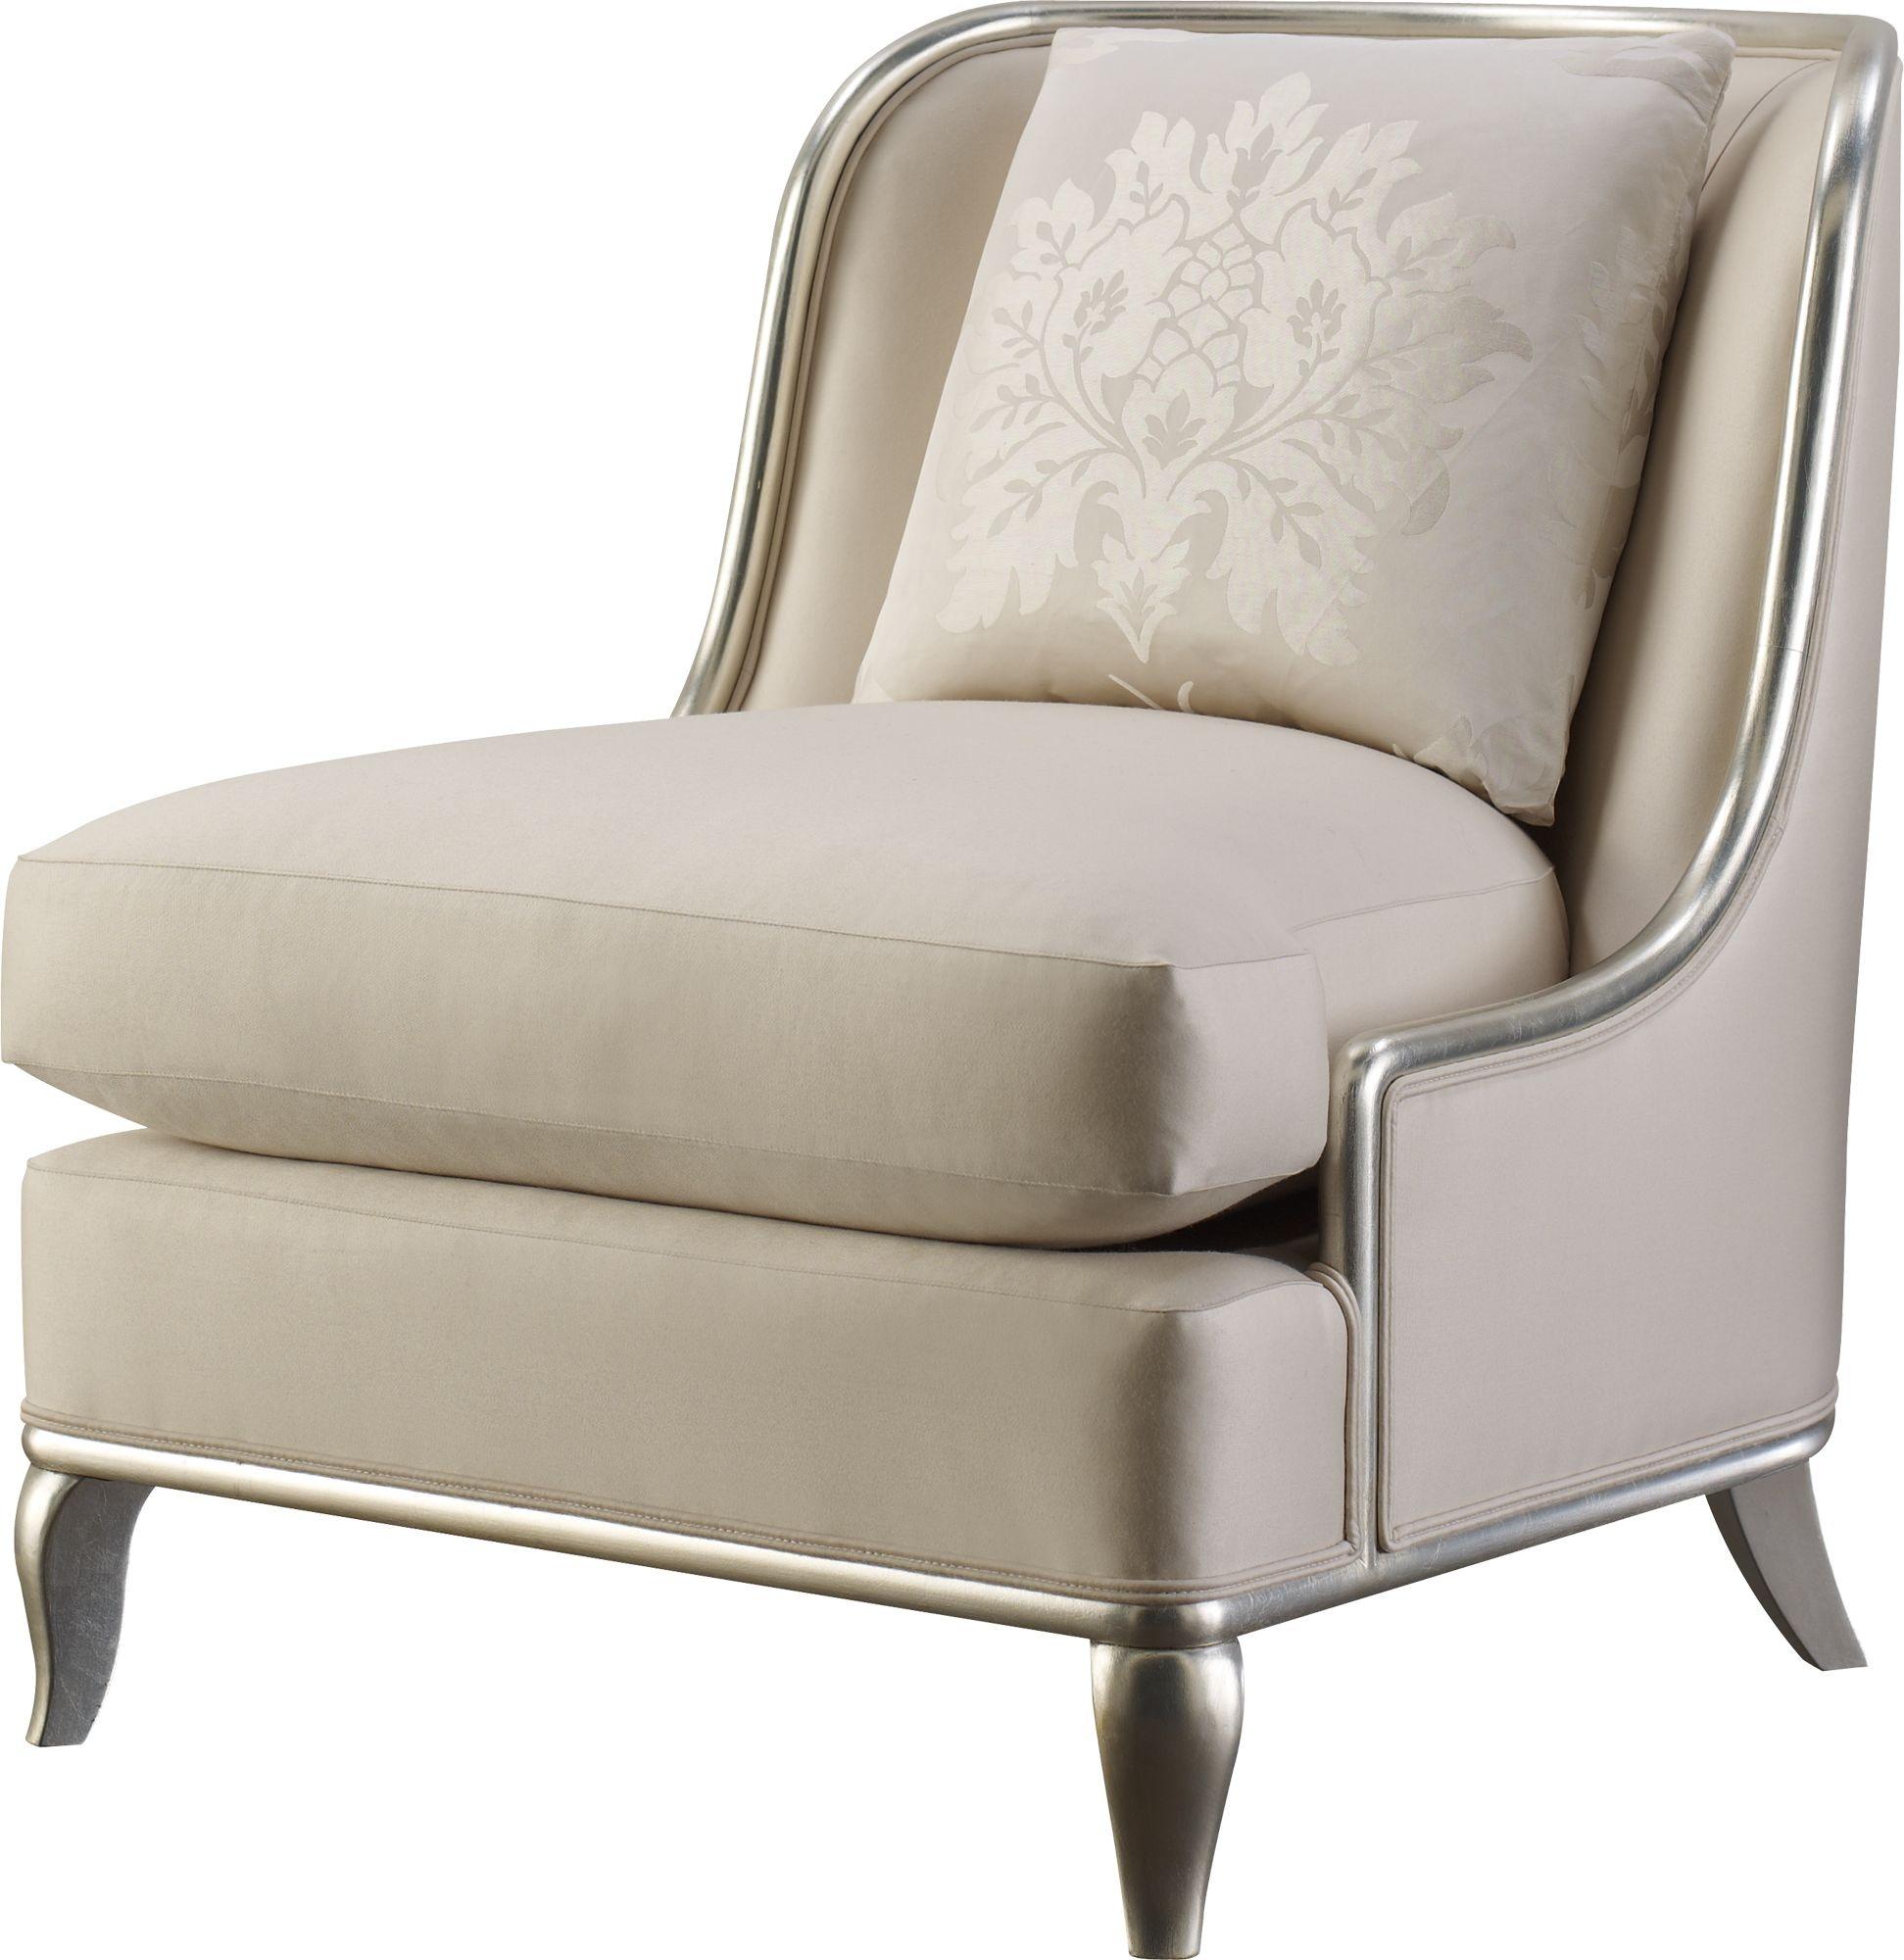 Baker Furniture Barbara Barry|Baker Designer Upholstery Empress Chair 6709C